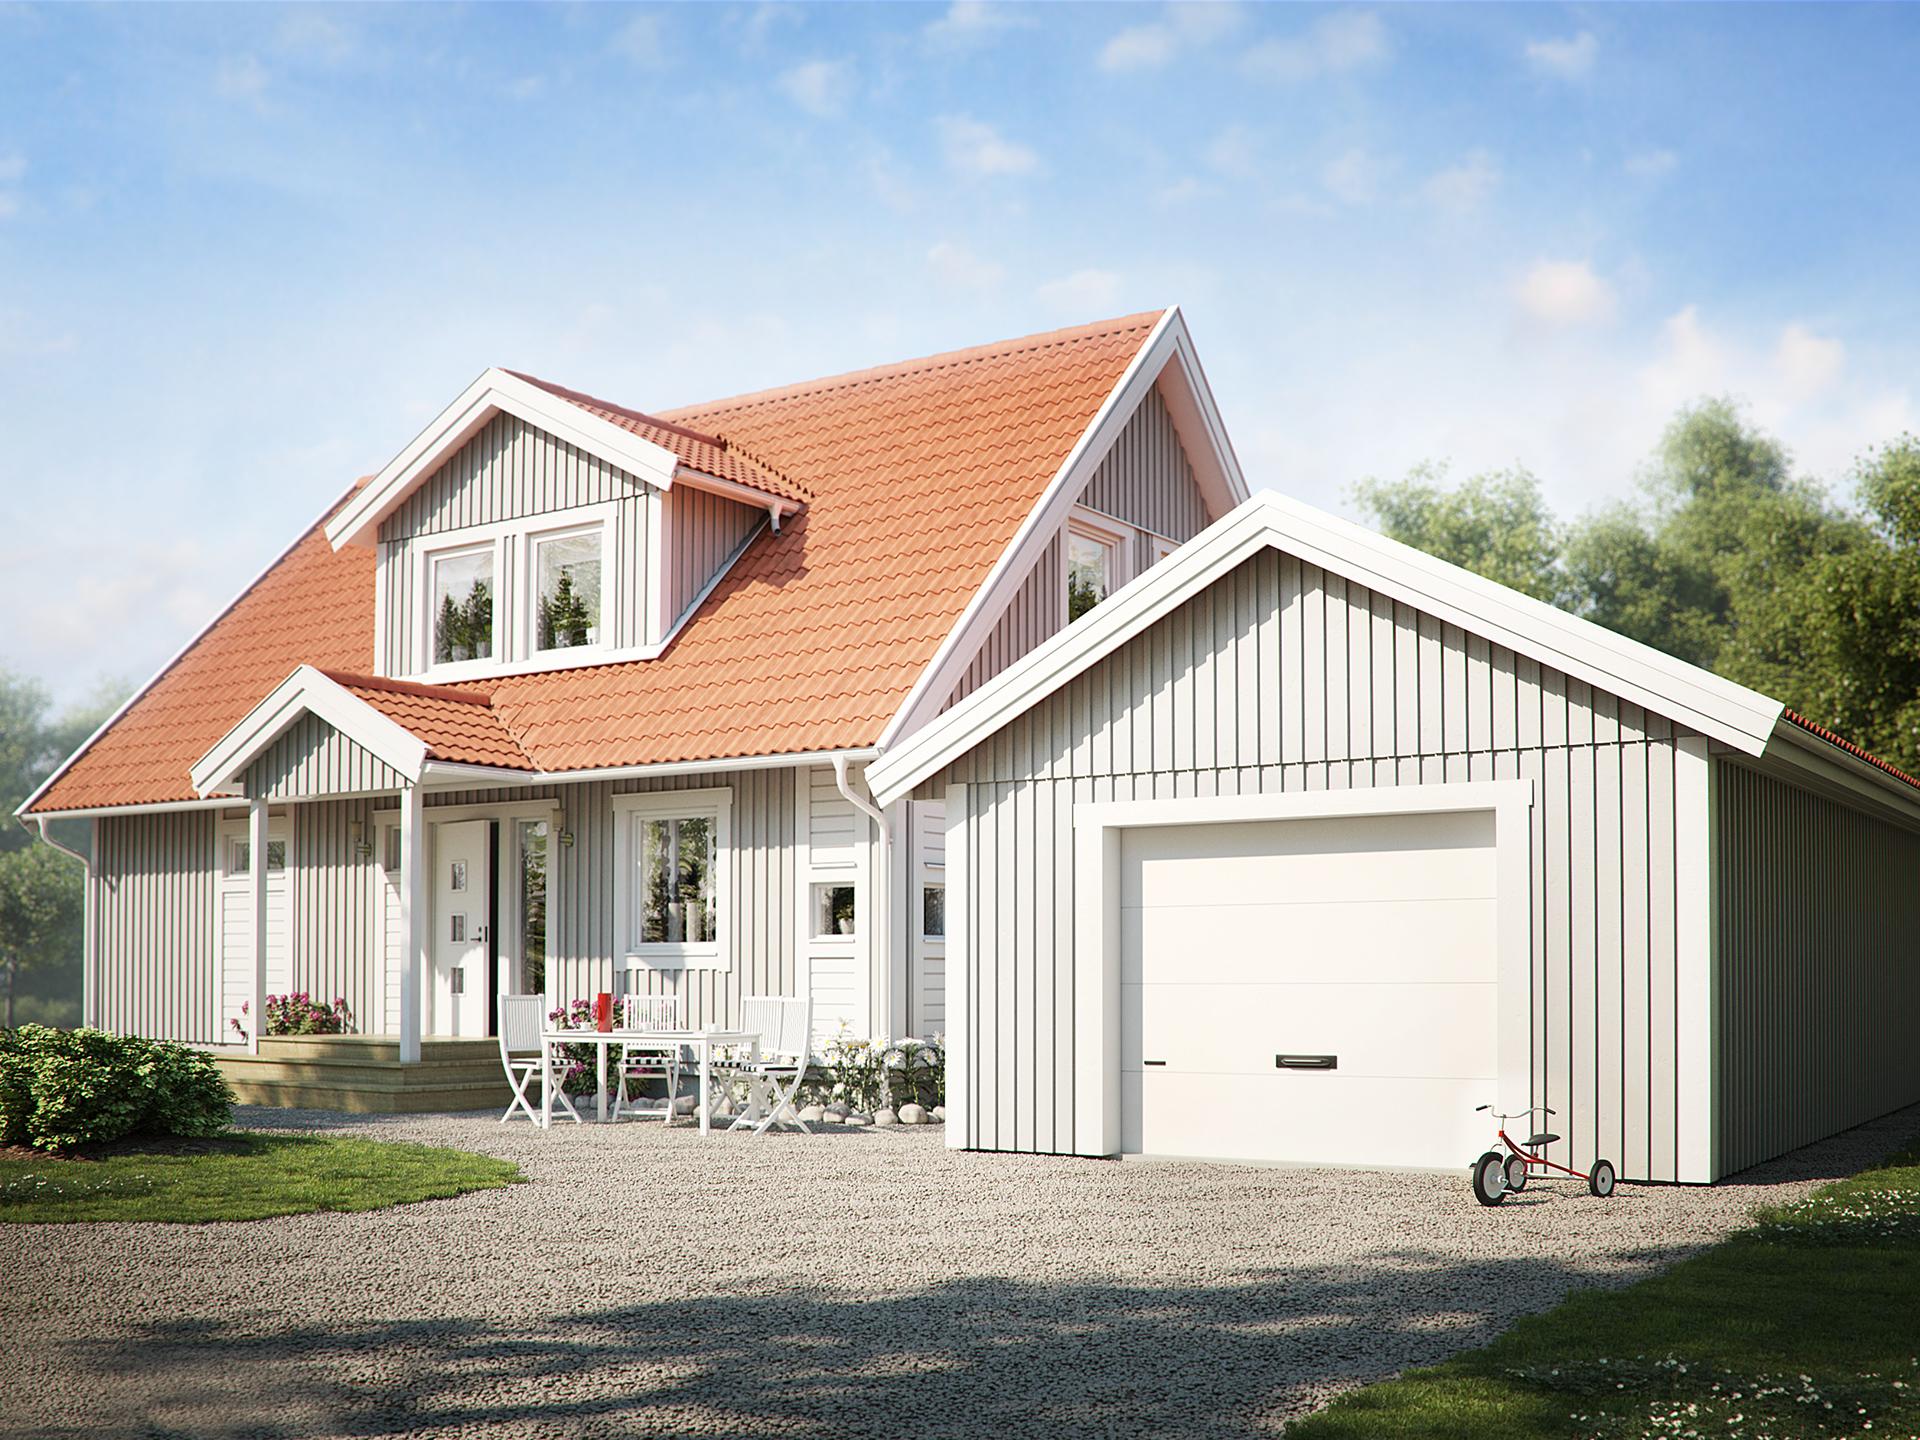 Garage 44 0 garage och sidobyggnad fr n sm landsvillan for Garage versailles 44